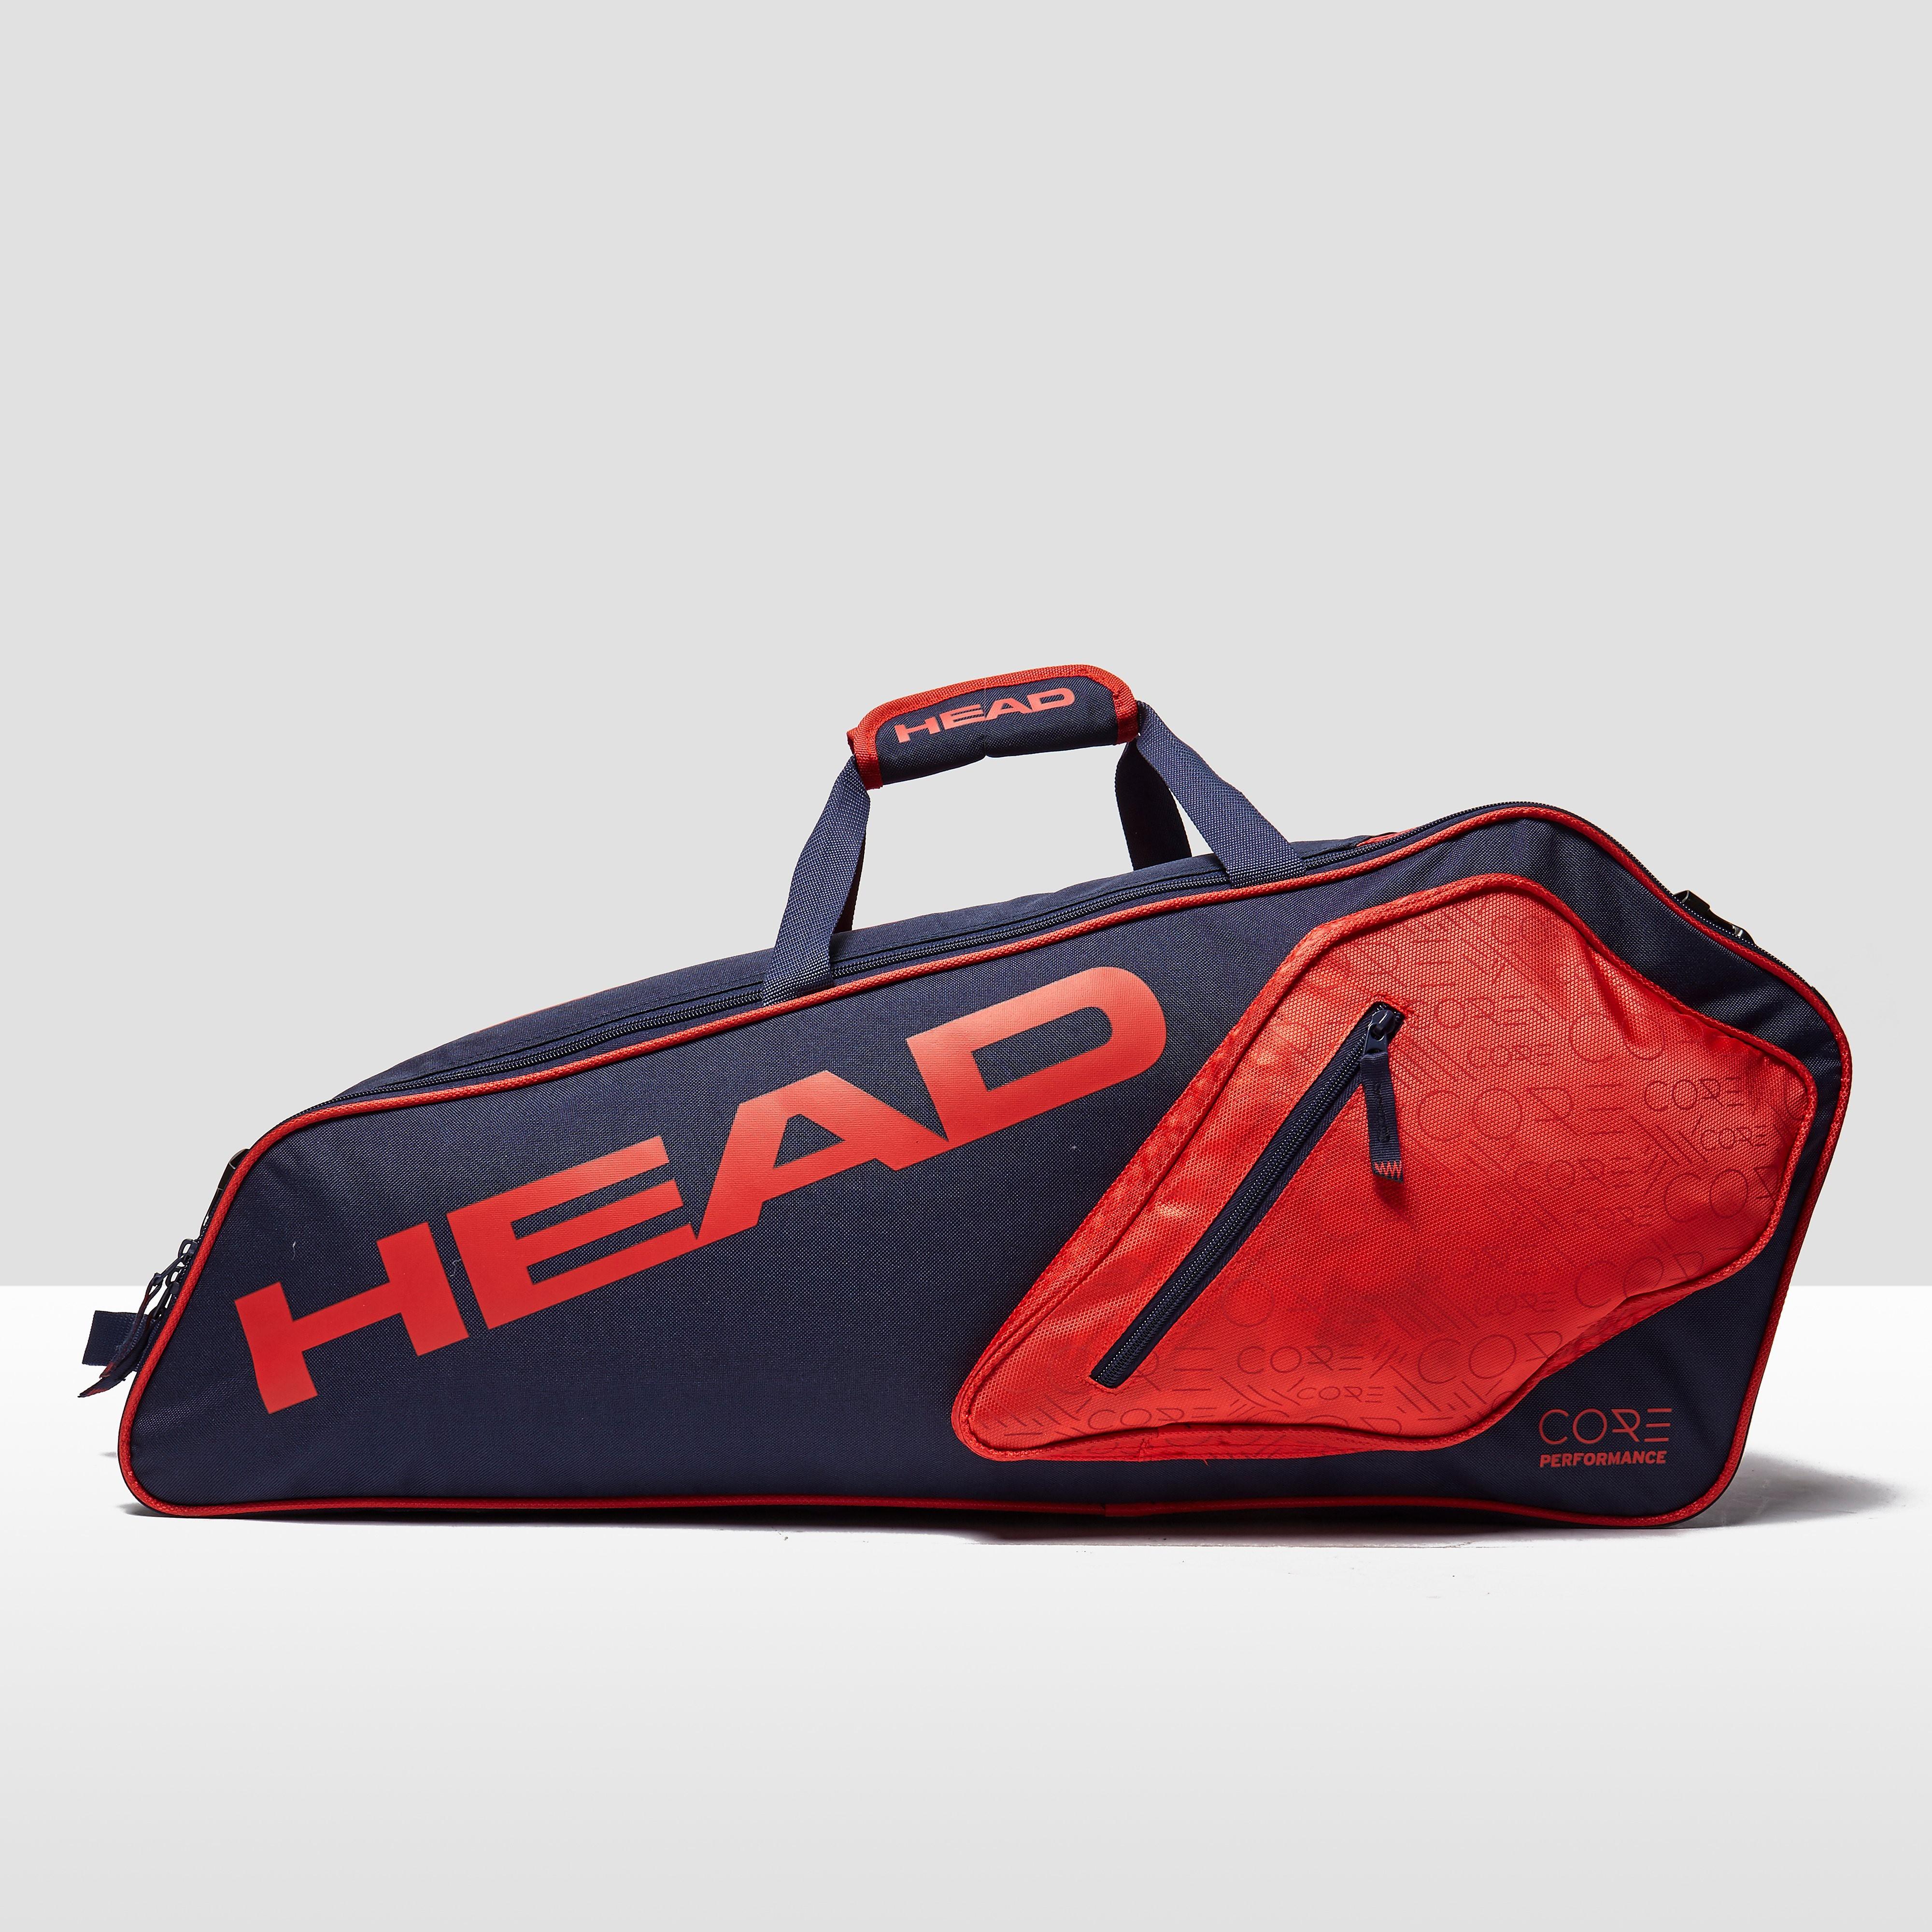 Head Core 6R Combi  Tennis Racketbag